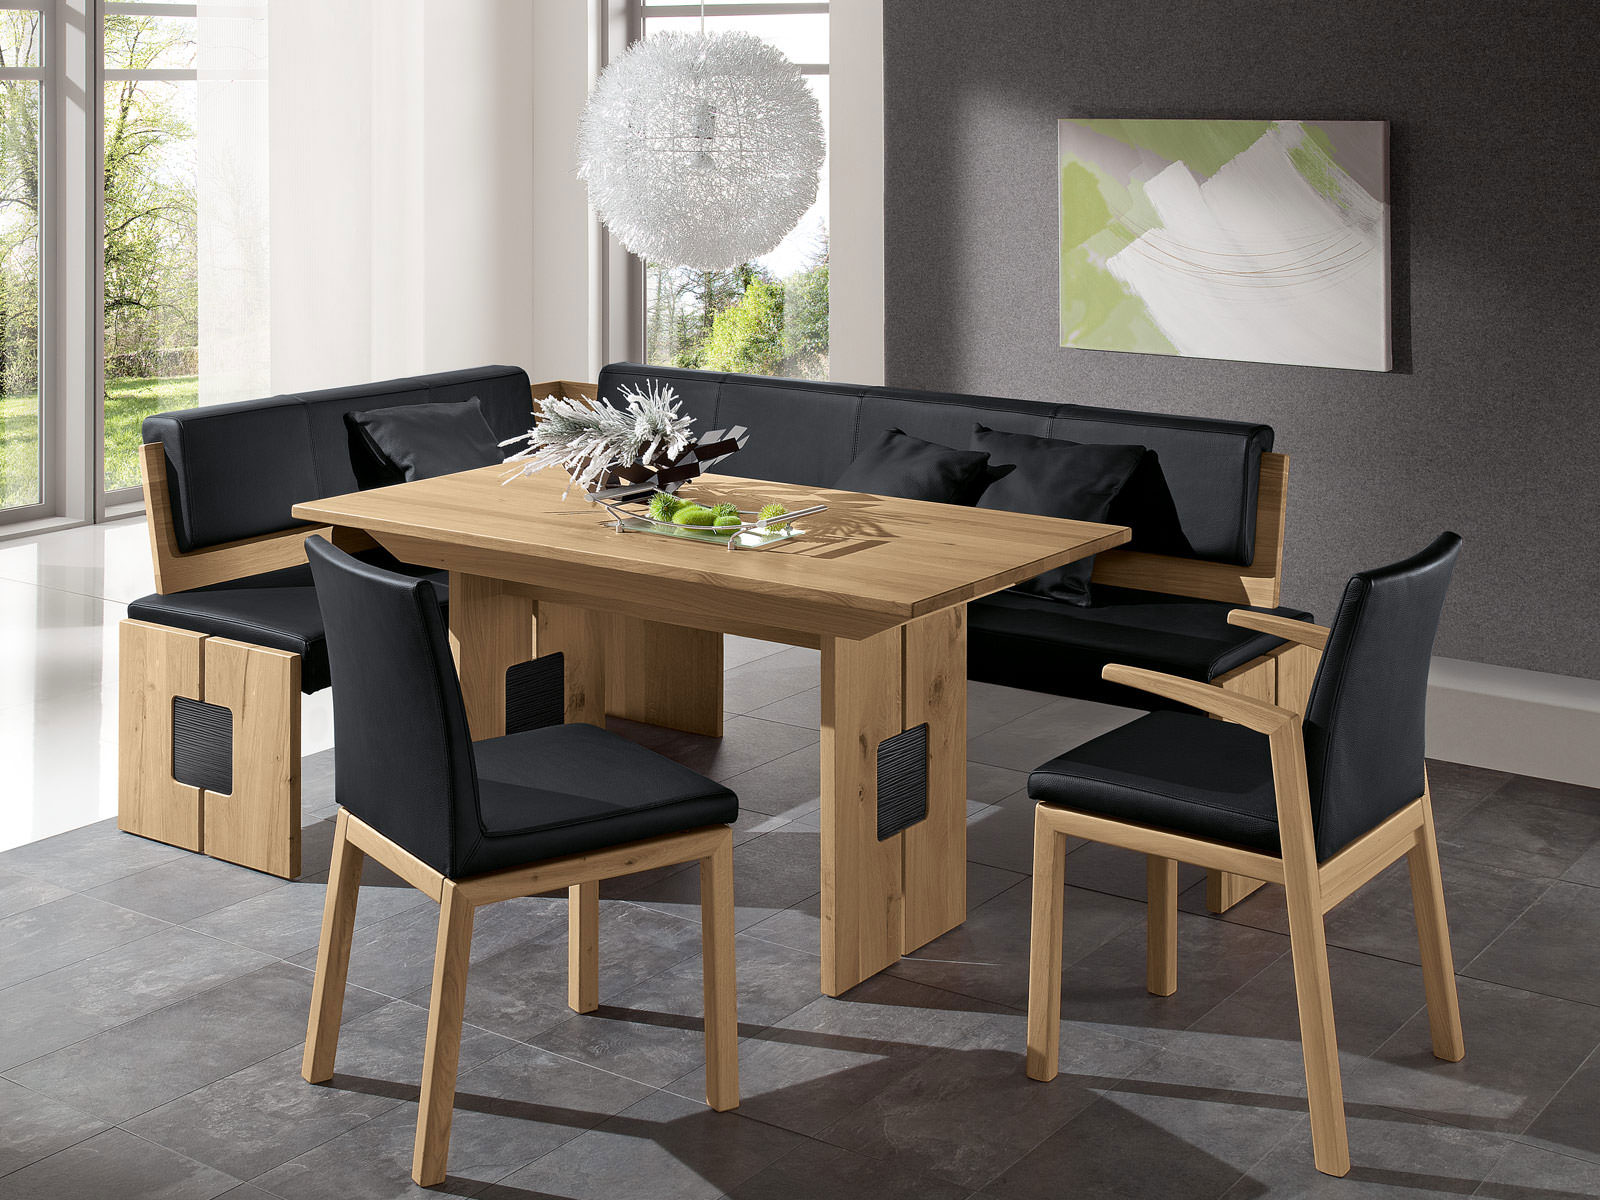 esstischgruppe mit eckbank. wssner eckbankgruppe dining collection, Modern Dekoo